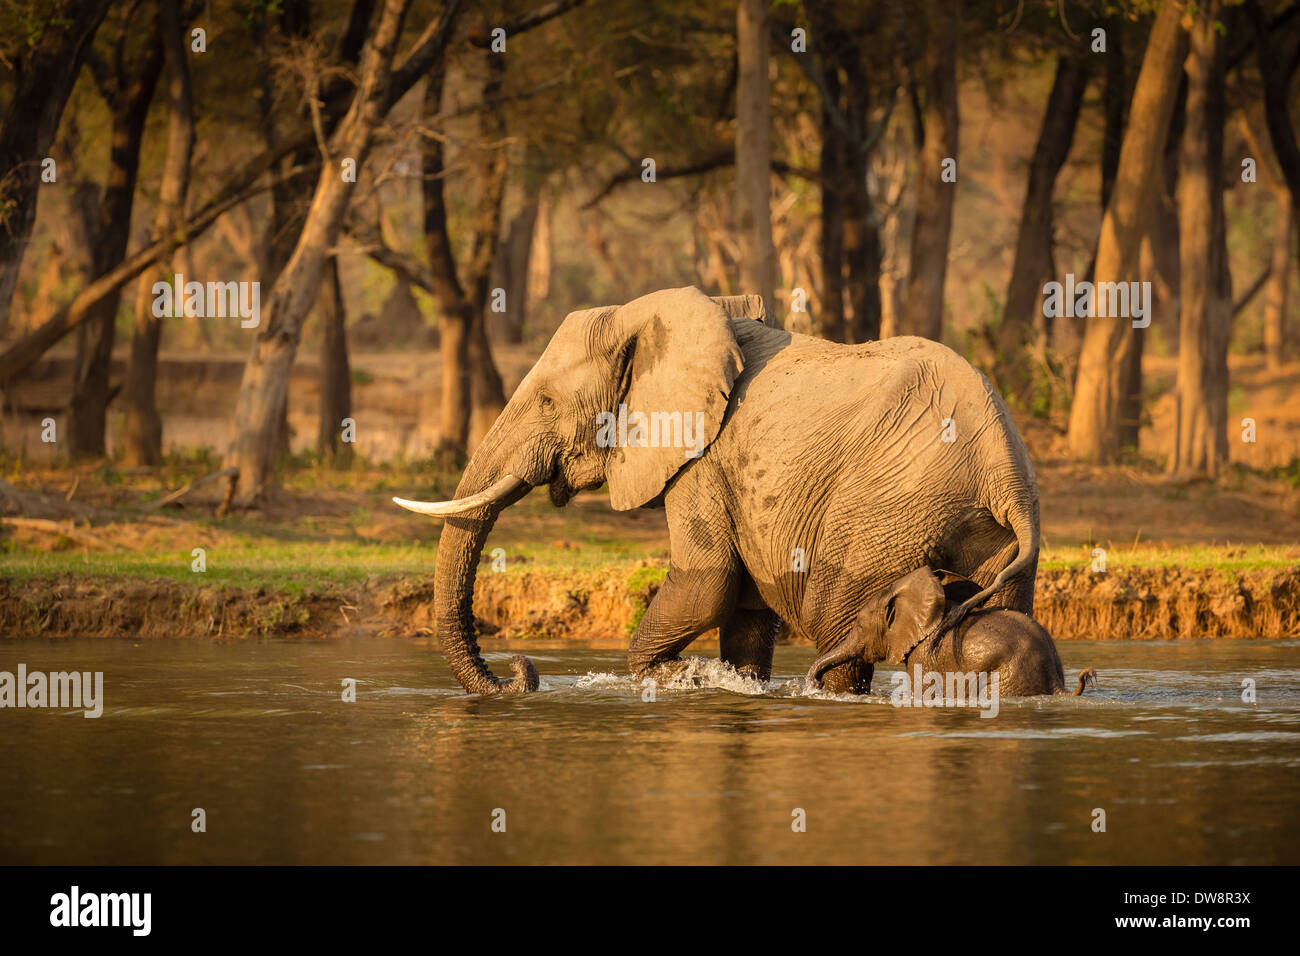 Zambia, Lower Zambezi National Park, African elephant (Loxodonta africana) mother and calf crossing the water. - Stock Image